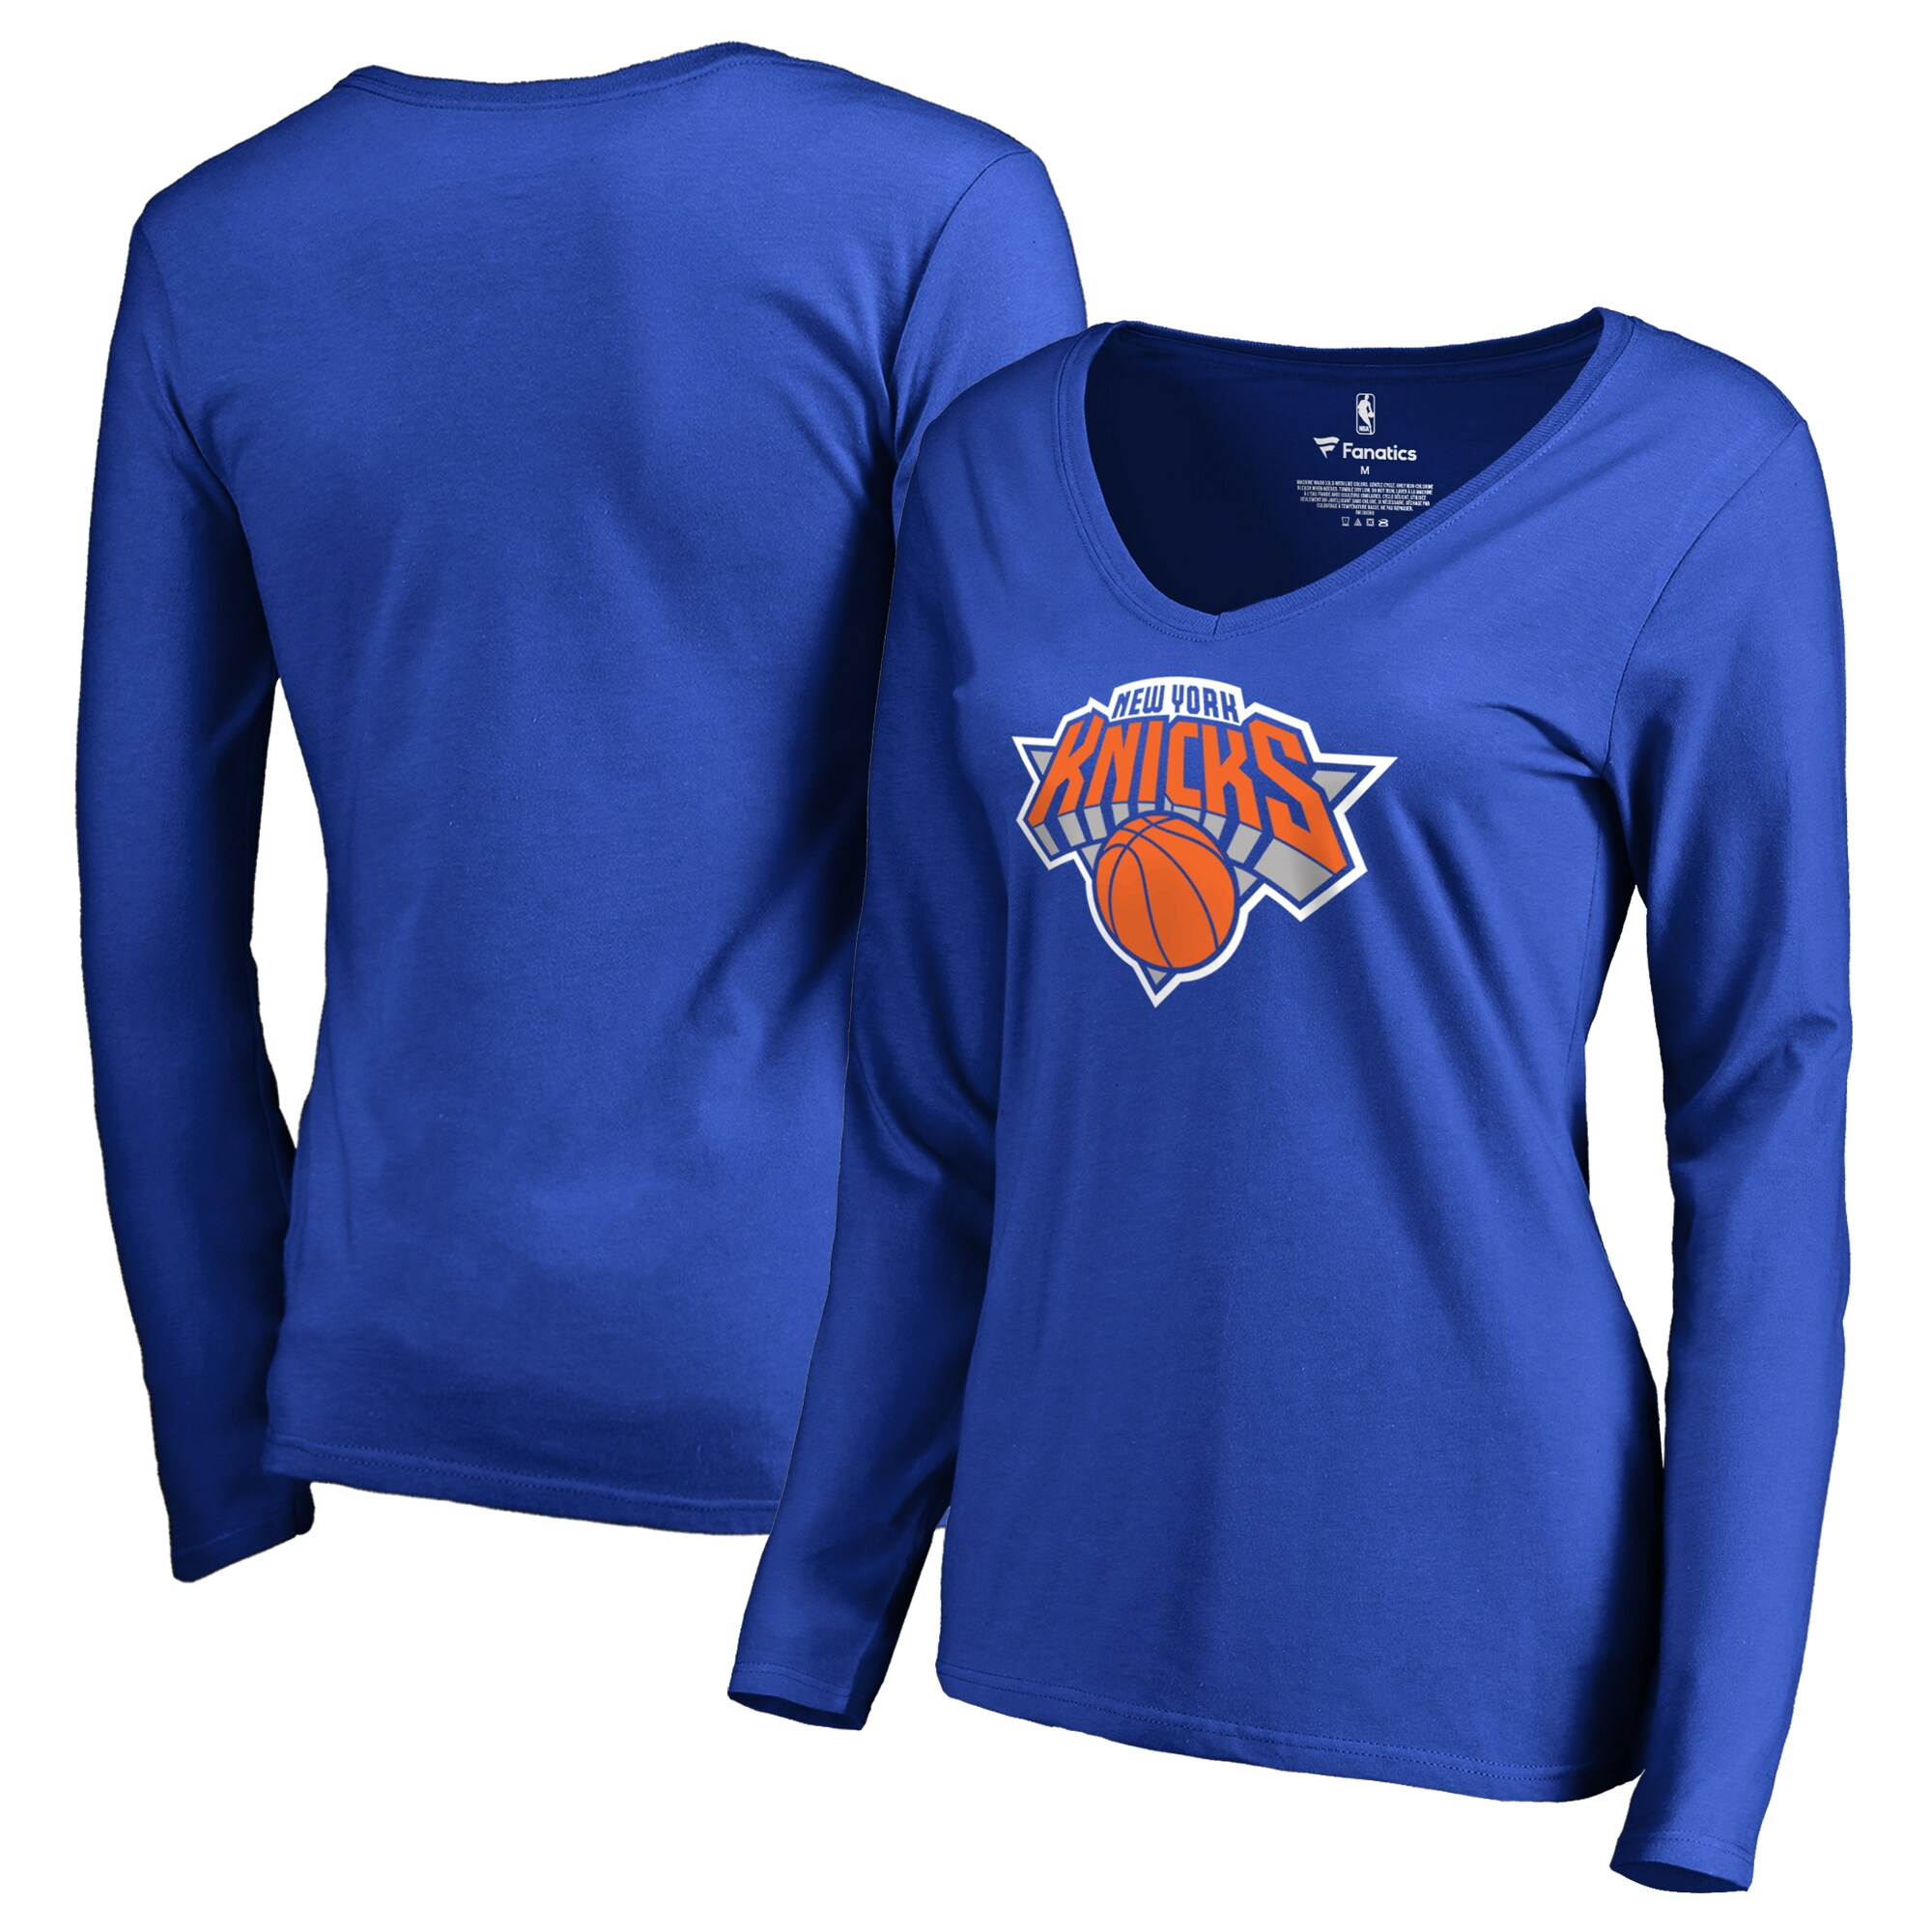 New York Knicks Fanatics Branded Women's Primary Logo V-Neck Long Sleeve T-Shirt - Royal